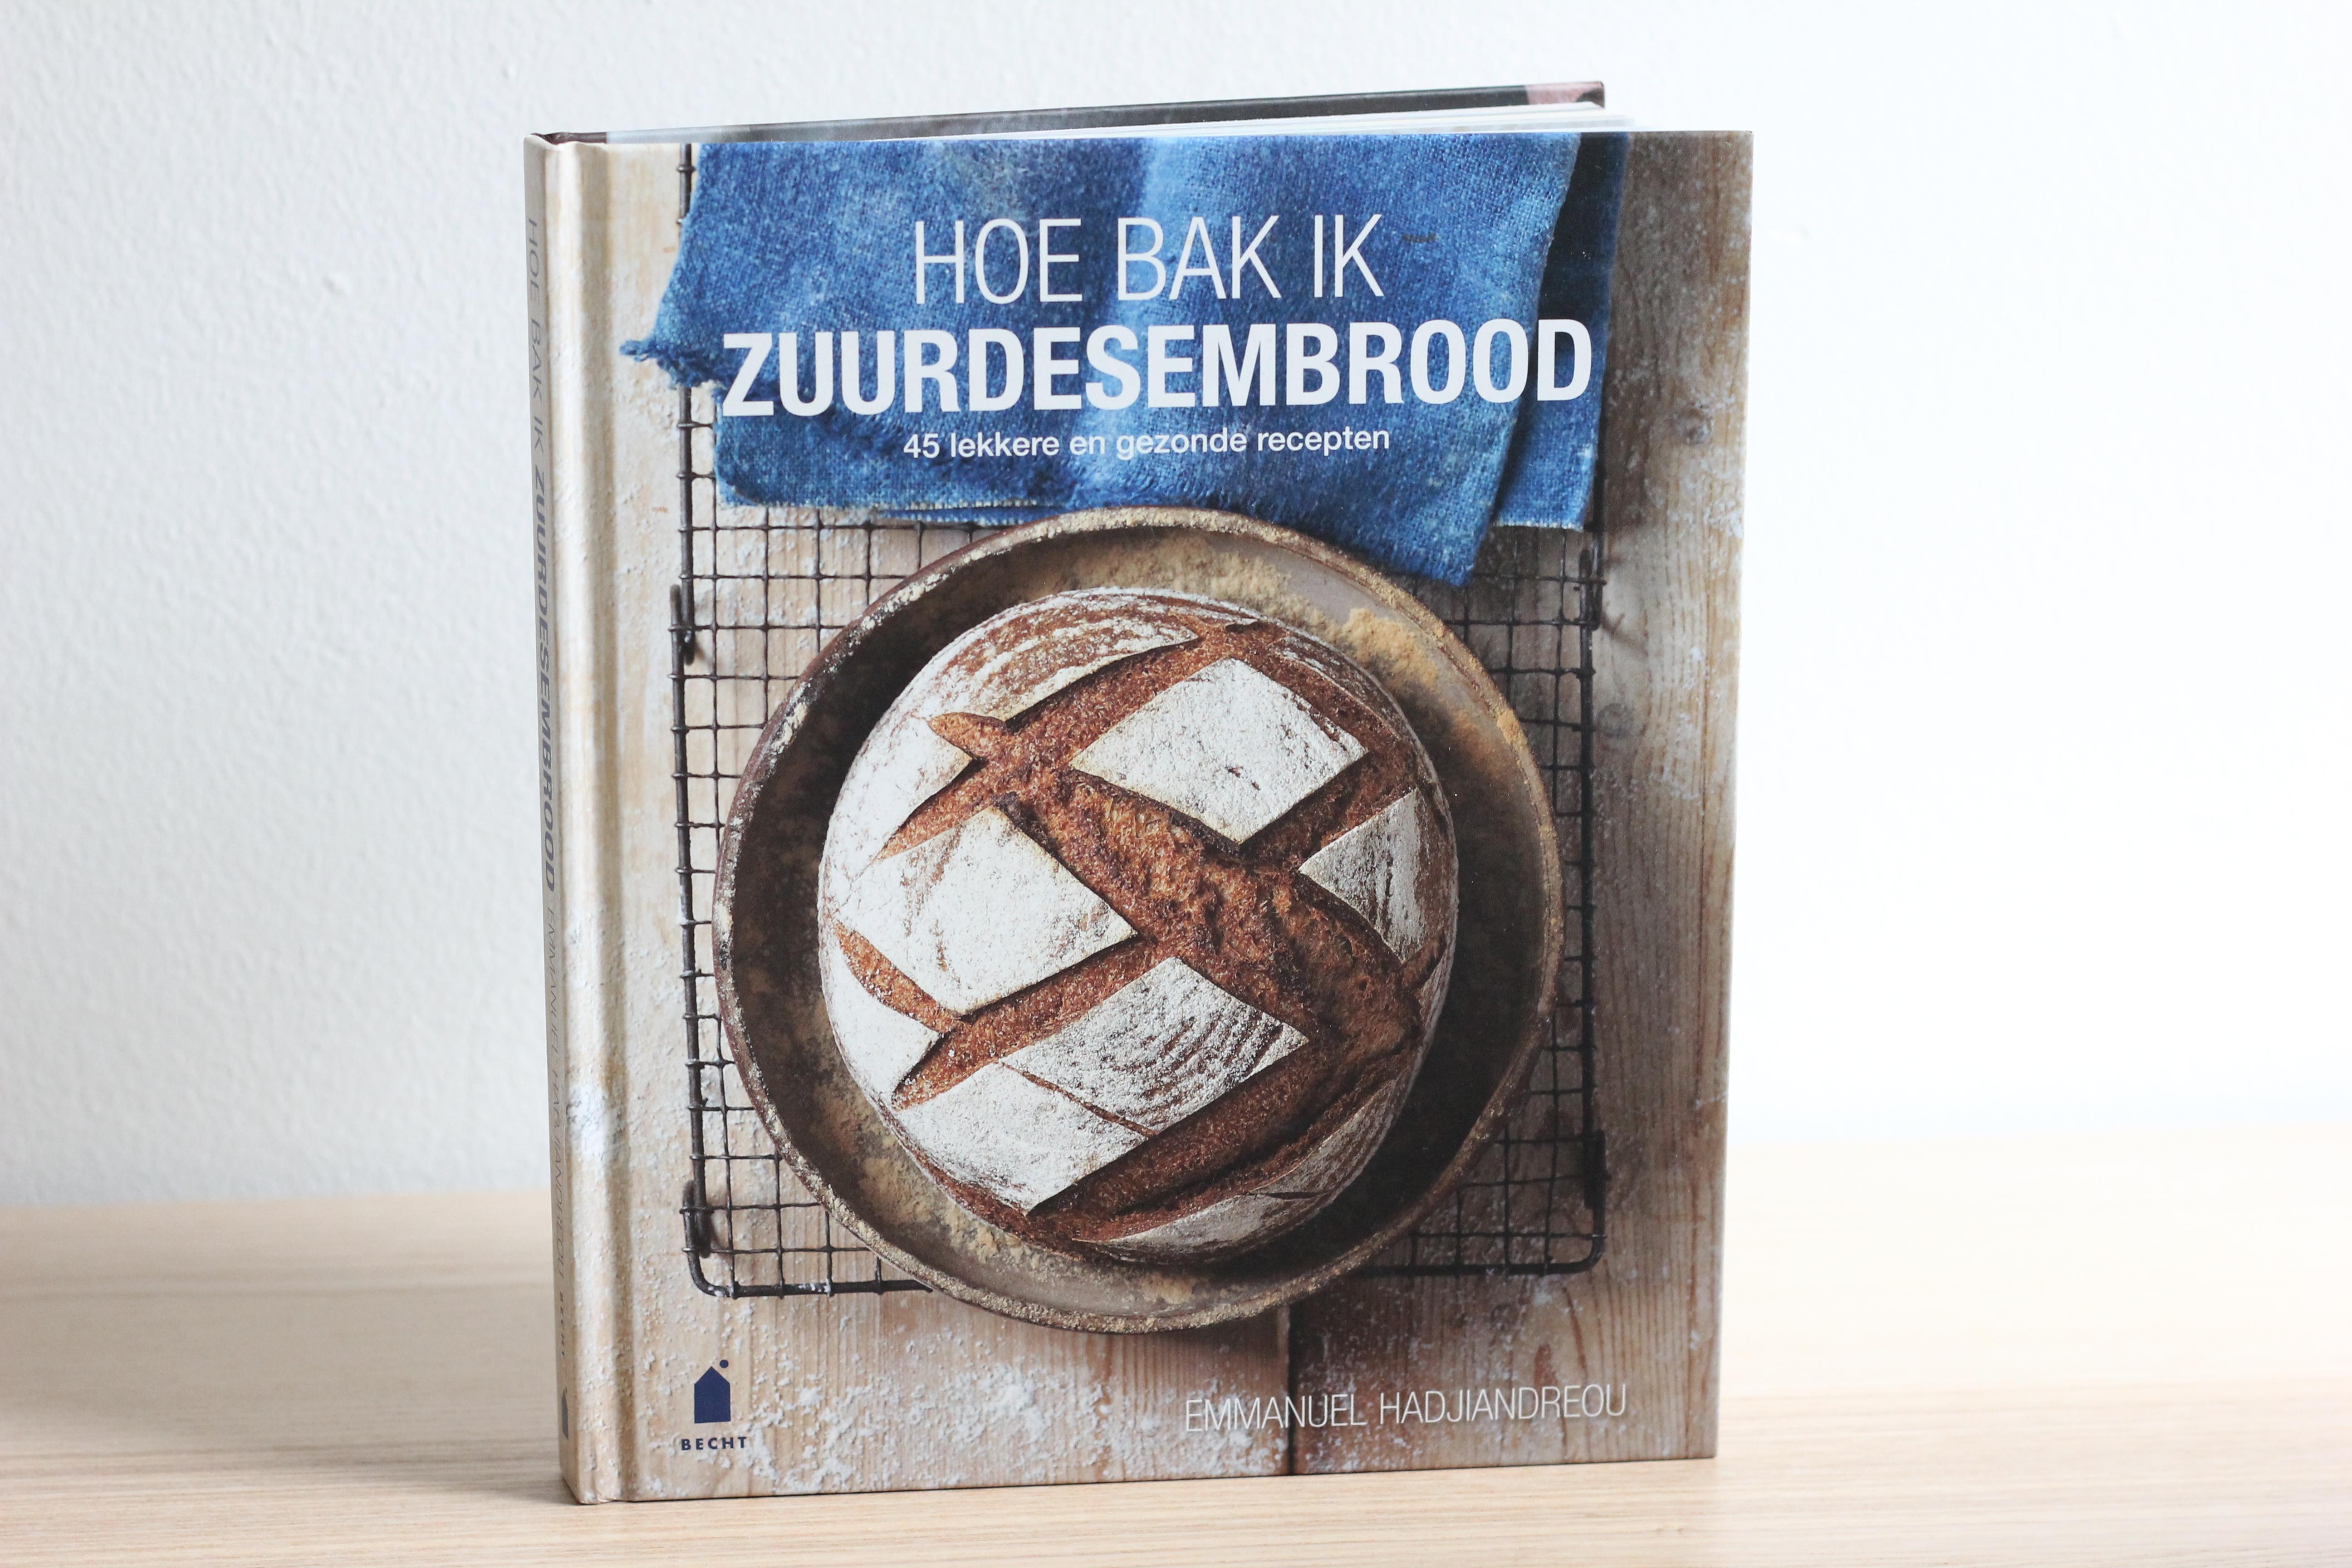 Boekrecenise: Hoe bak ik zuurdesembrood @ Lauriekoek.nl